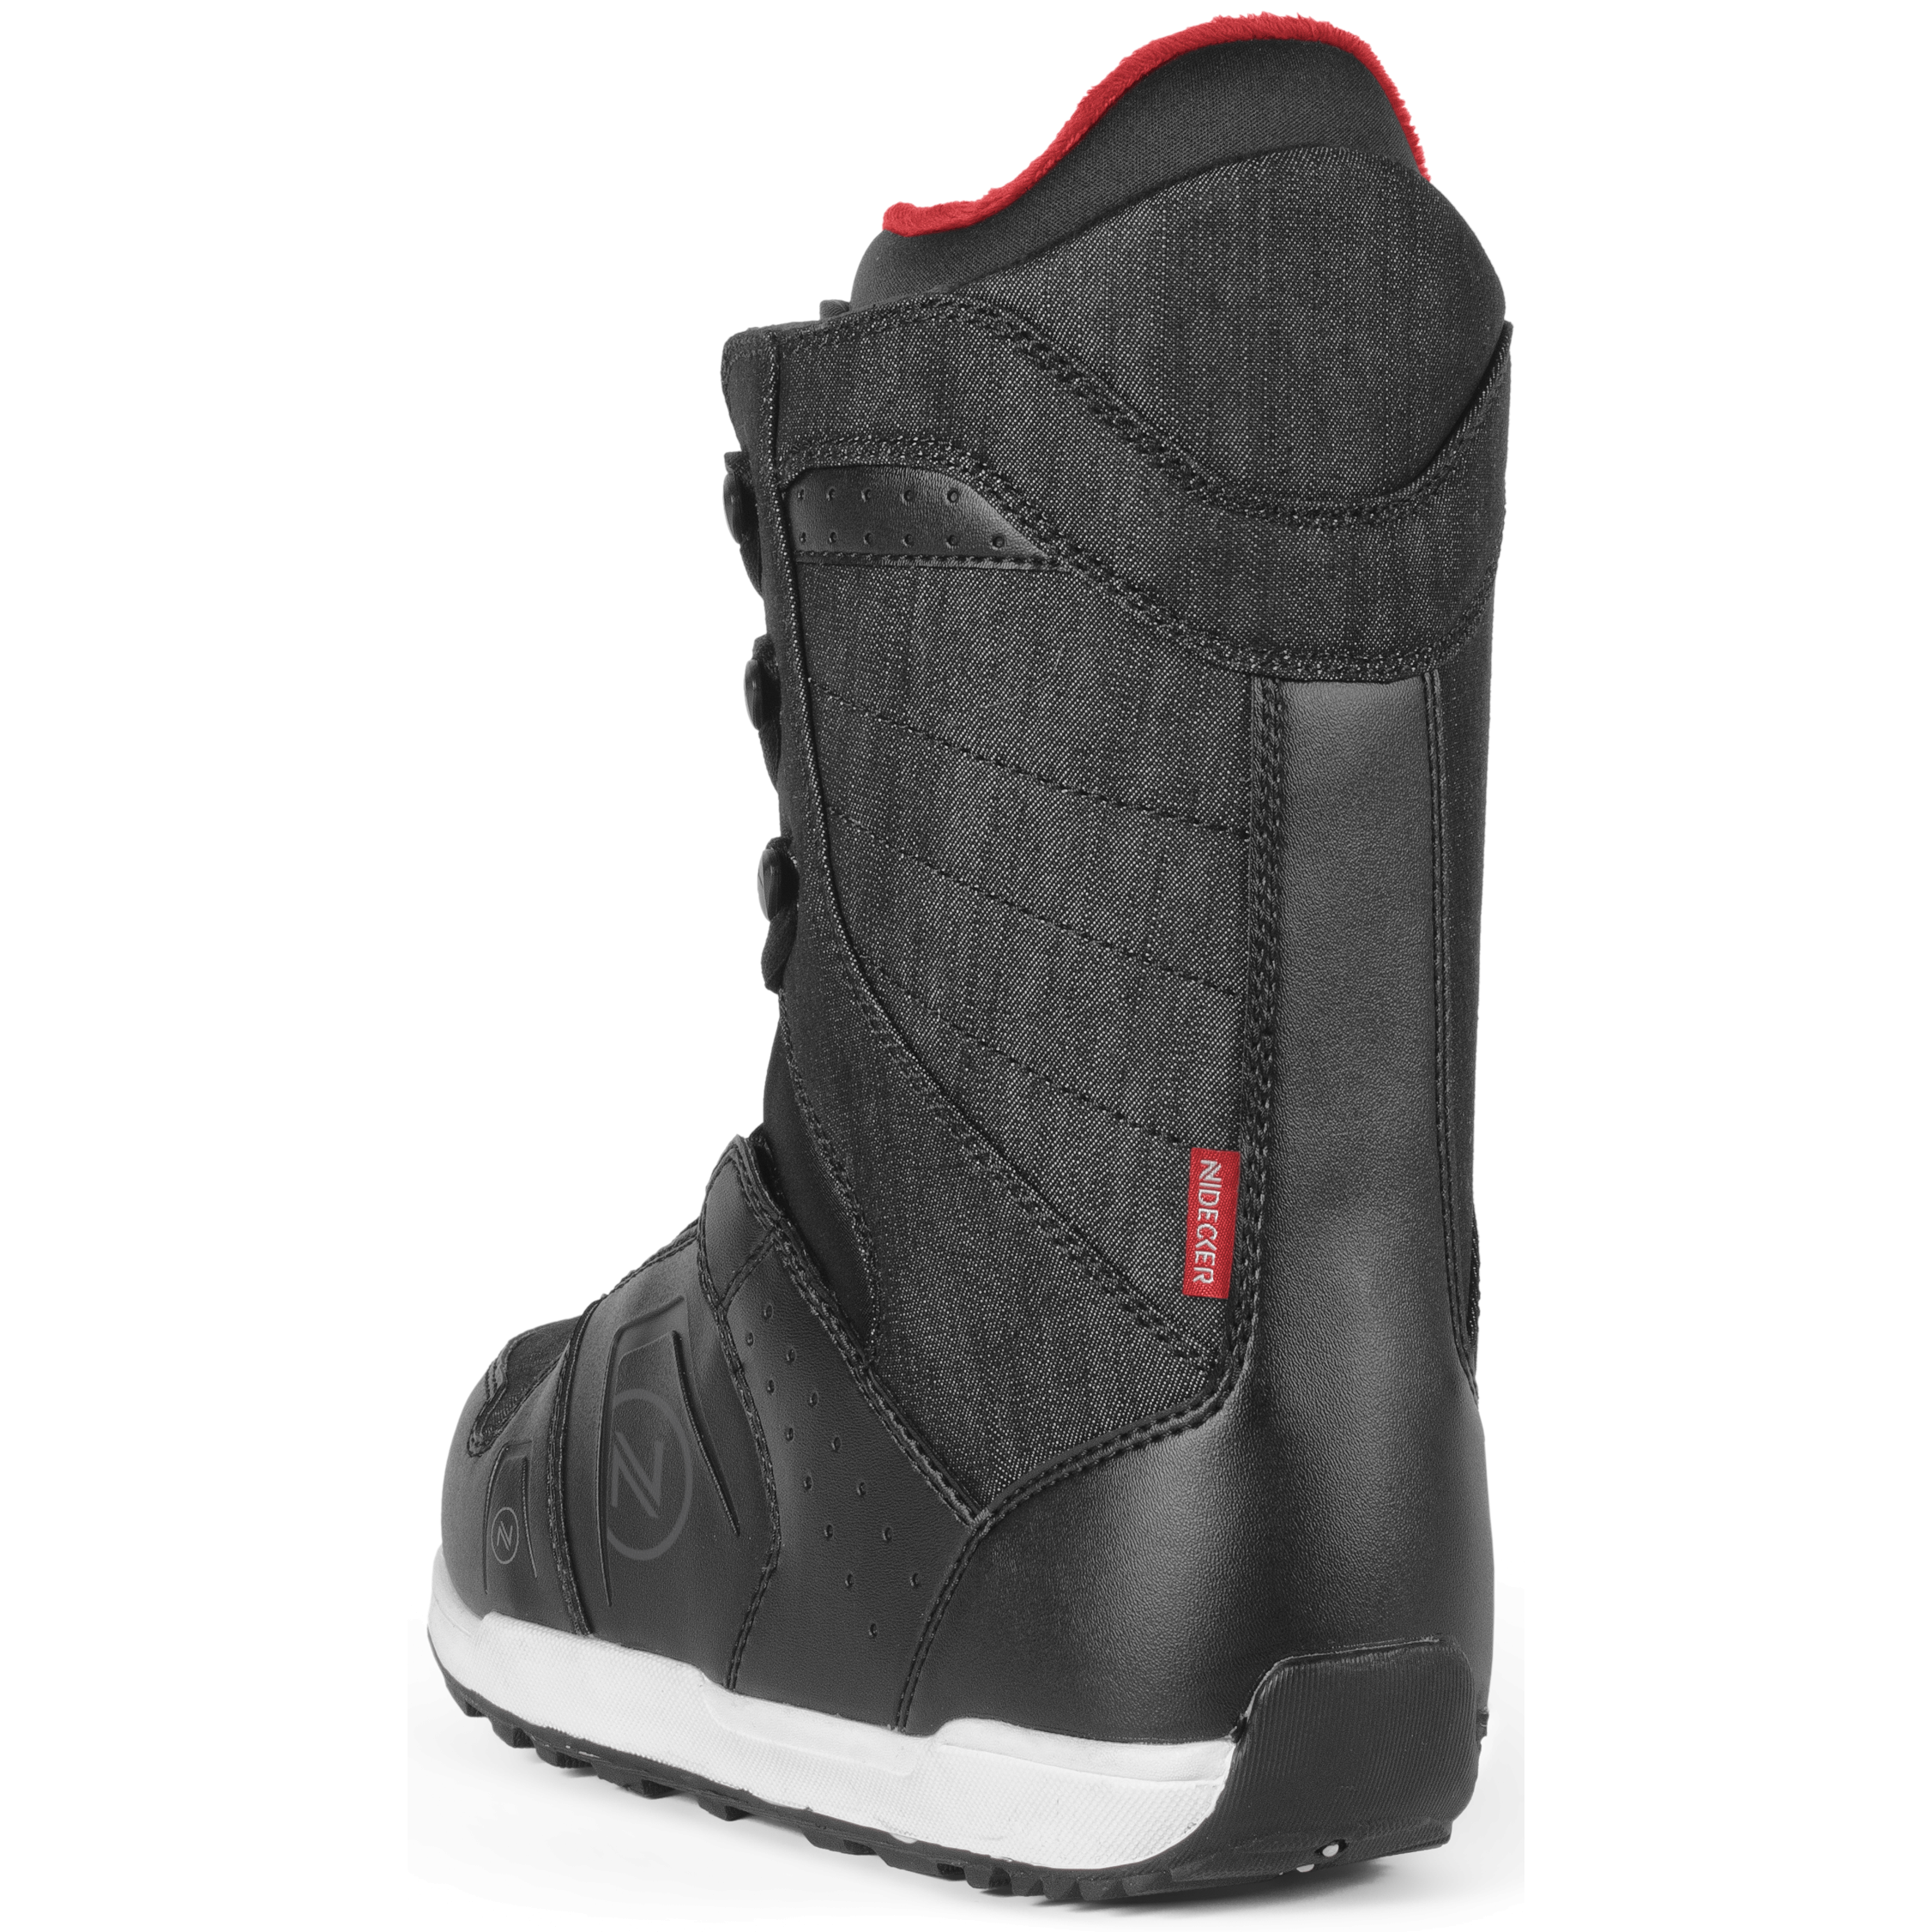 9c88b4ab63a6 Ботинки для сноуборда NIDECKER 2017-18 CHARGER LACE BLACK - купить ...